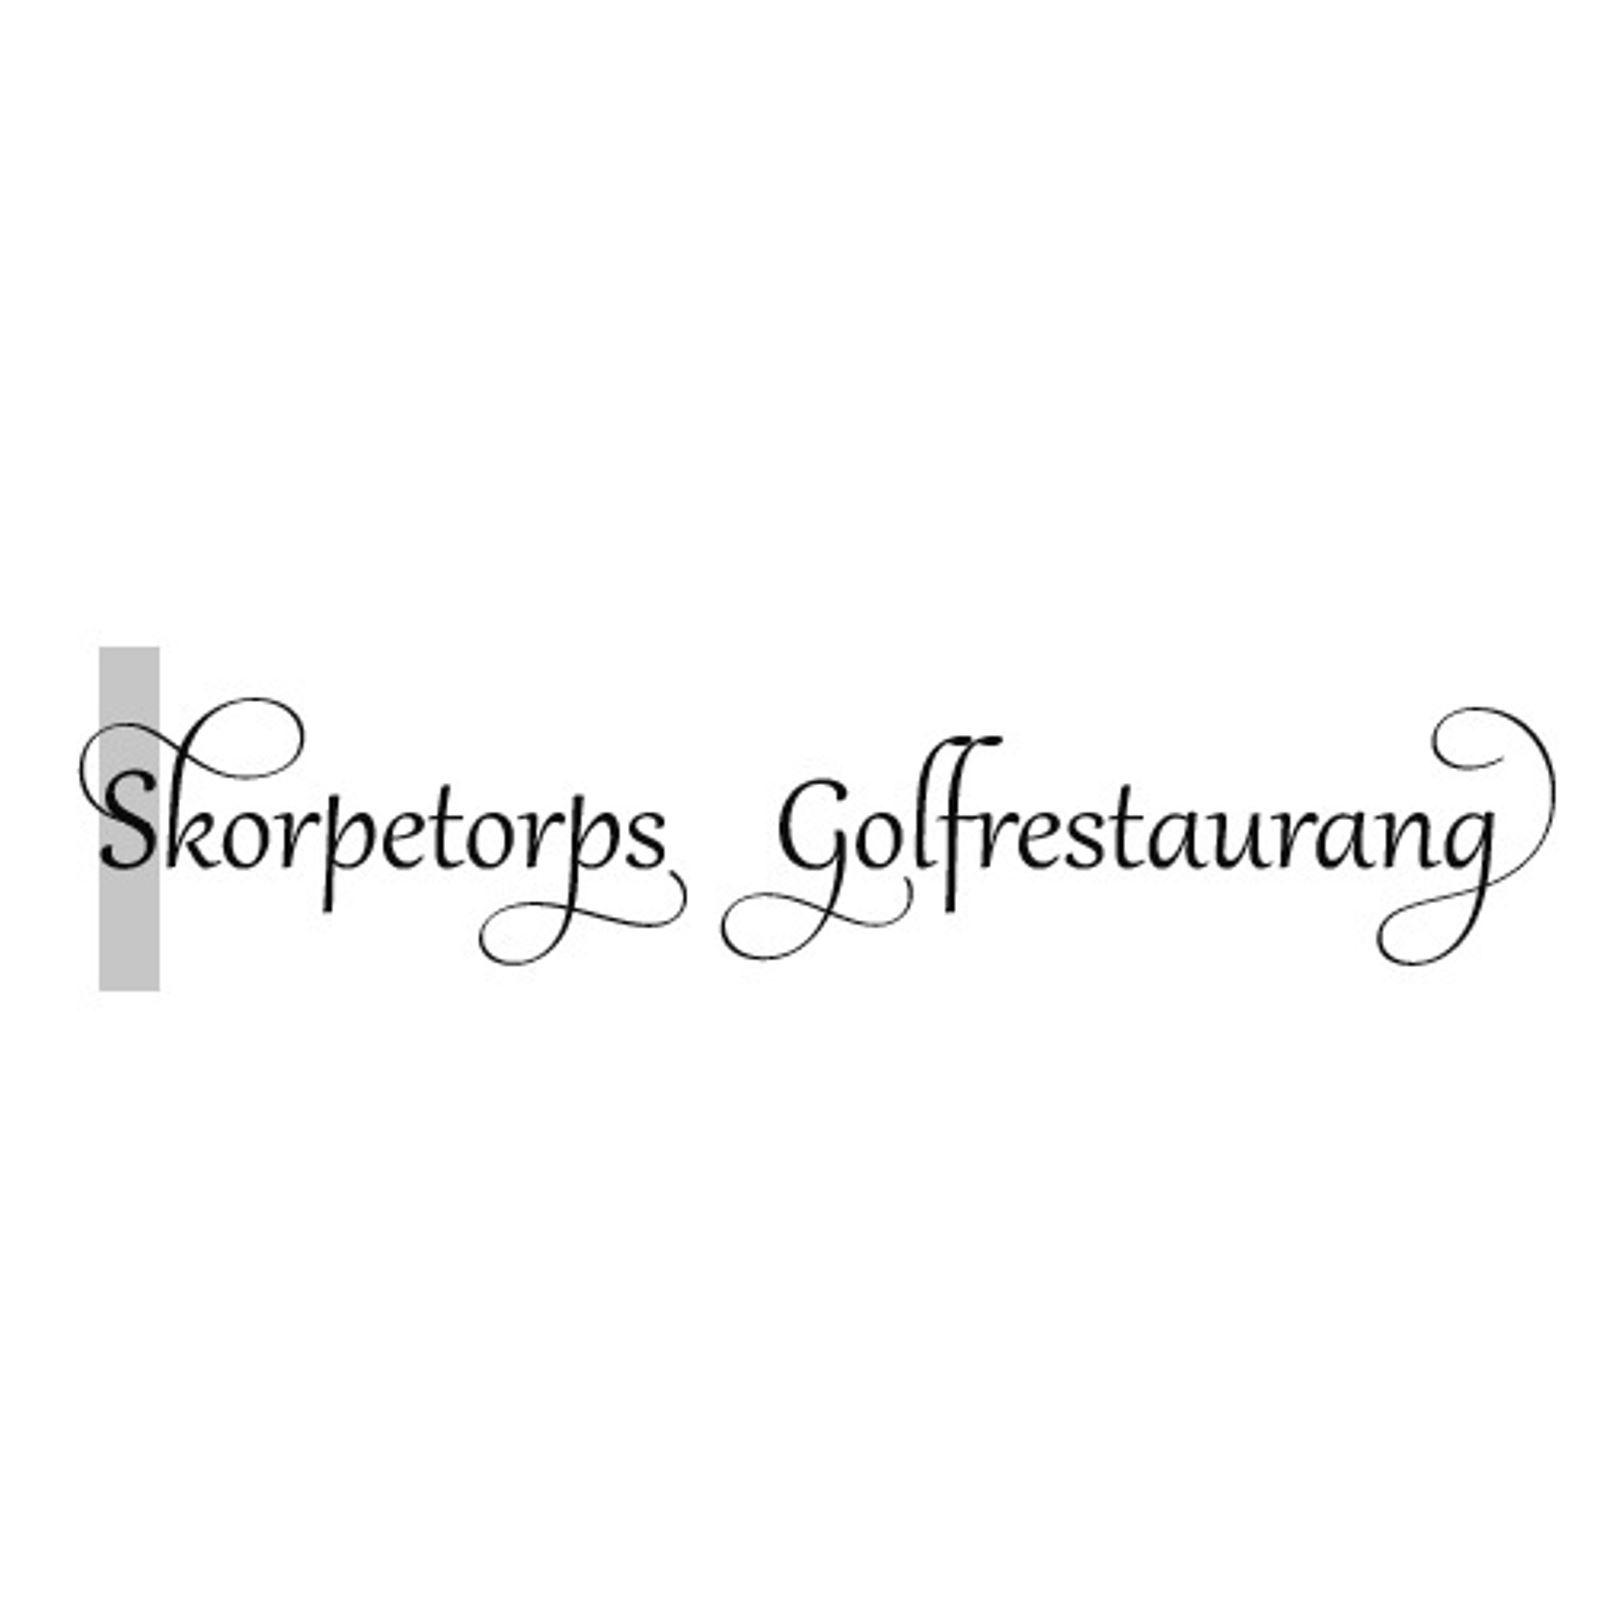 Skorpetorps golfrestaurang